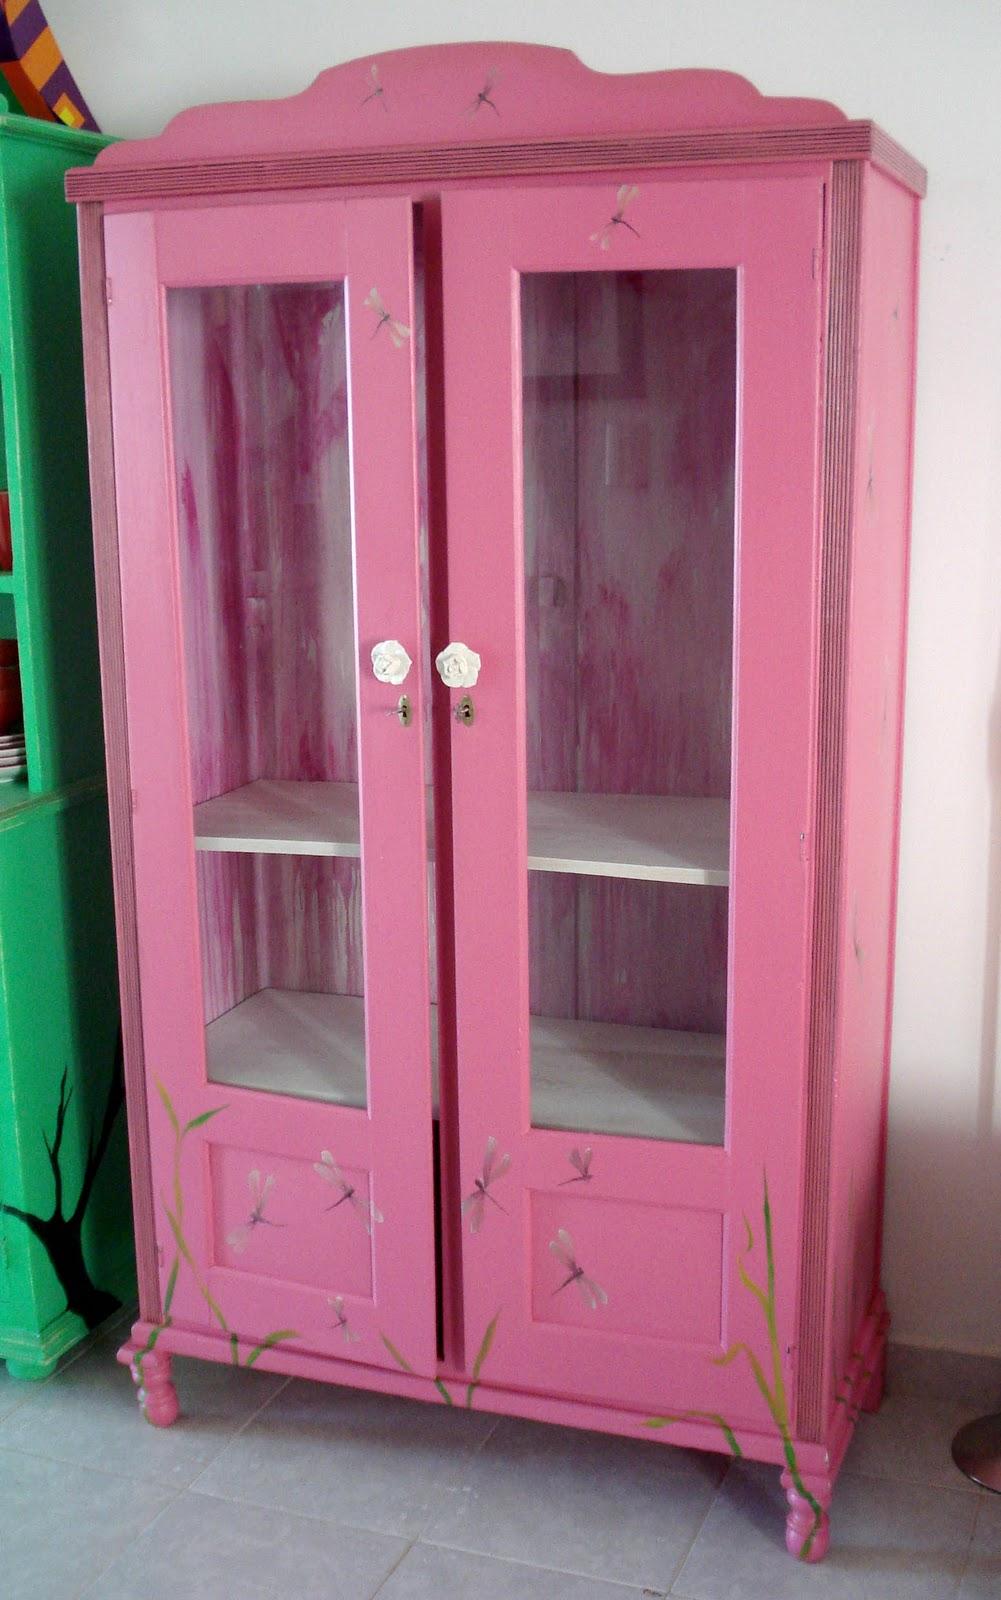 Furniture art diciembre 2010 for Roperos para habitaciones pequenas